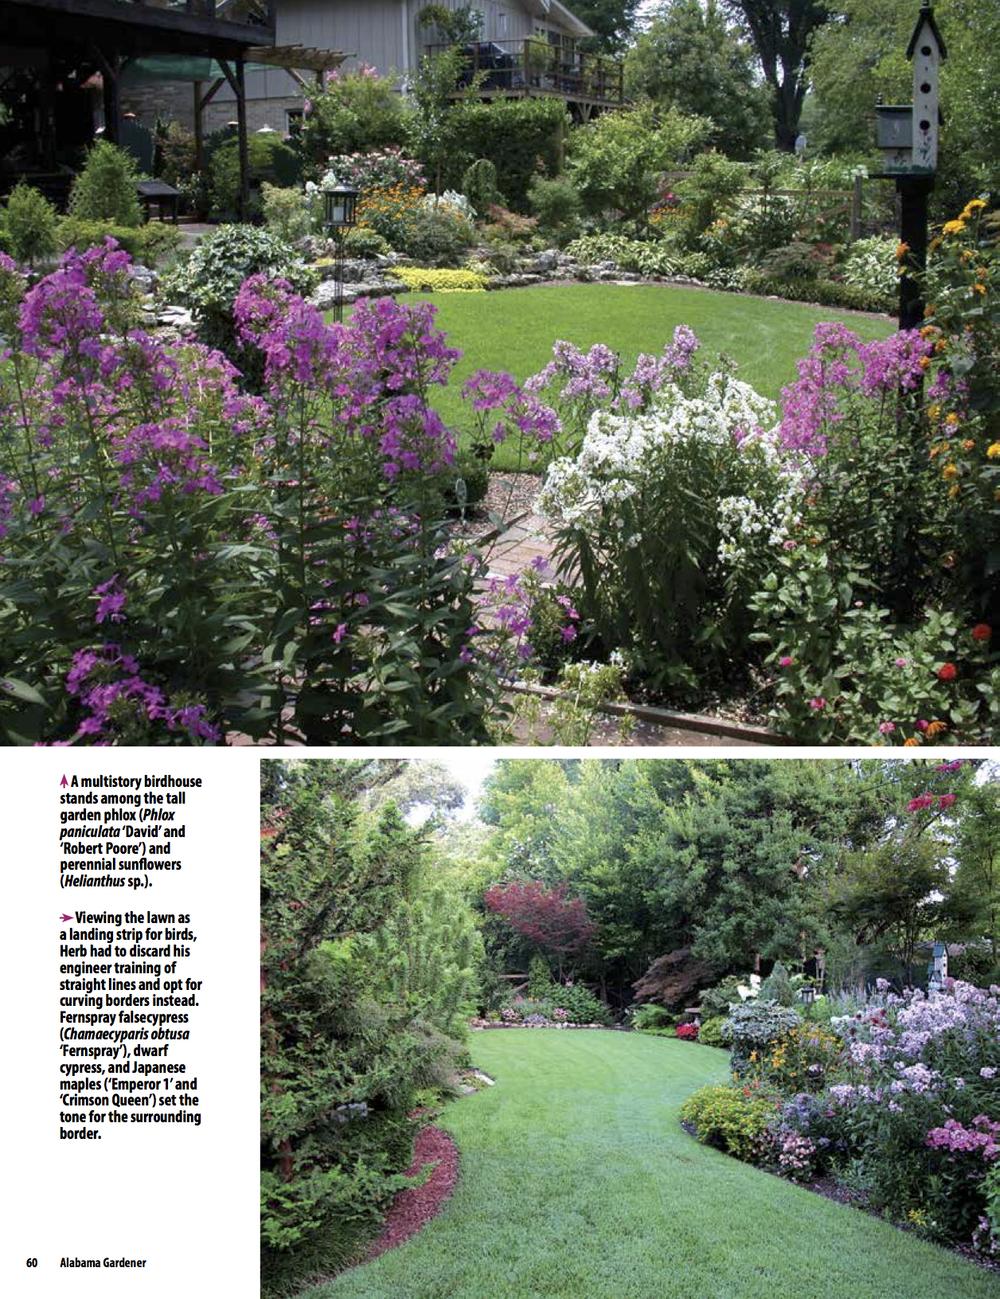 ALG_JulAug16_GardenProfile_Reynolds3.jpg